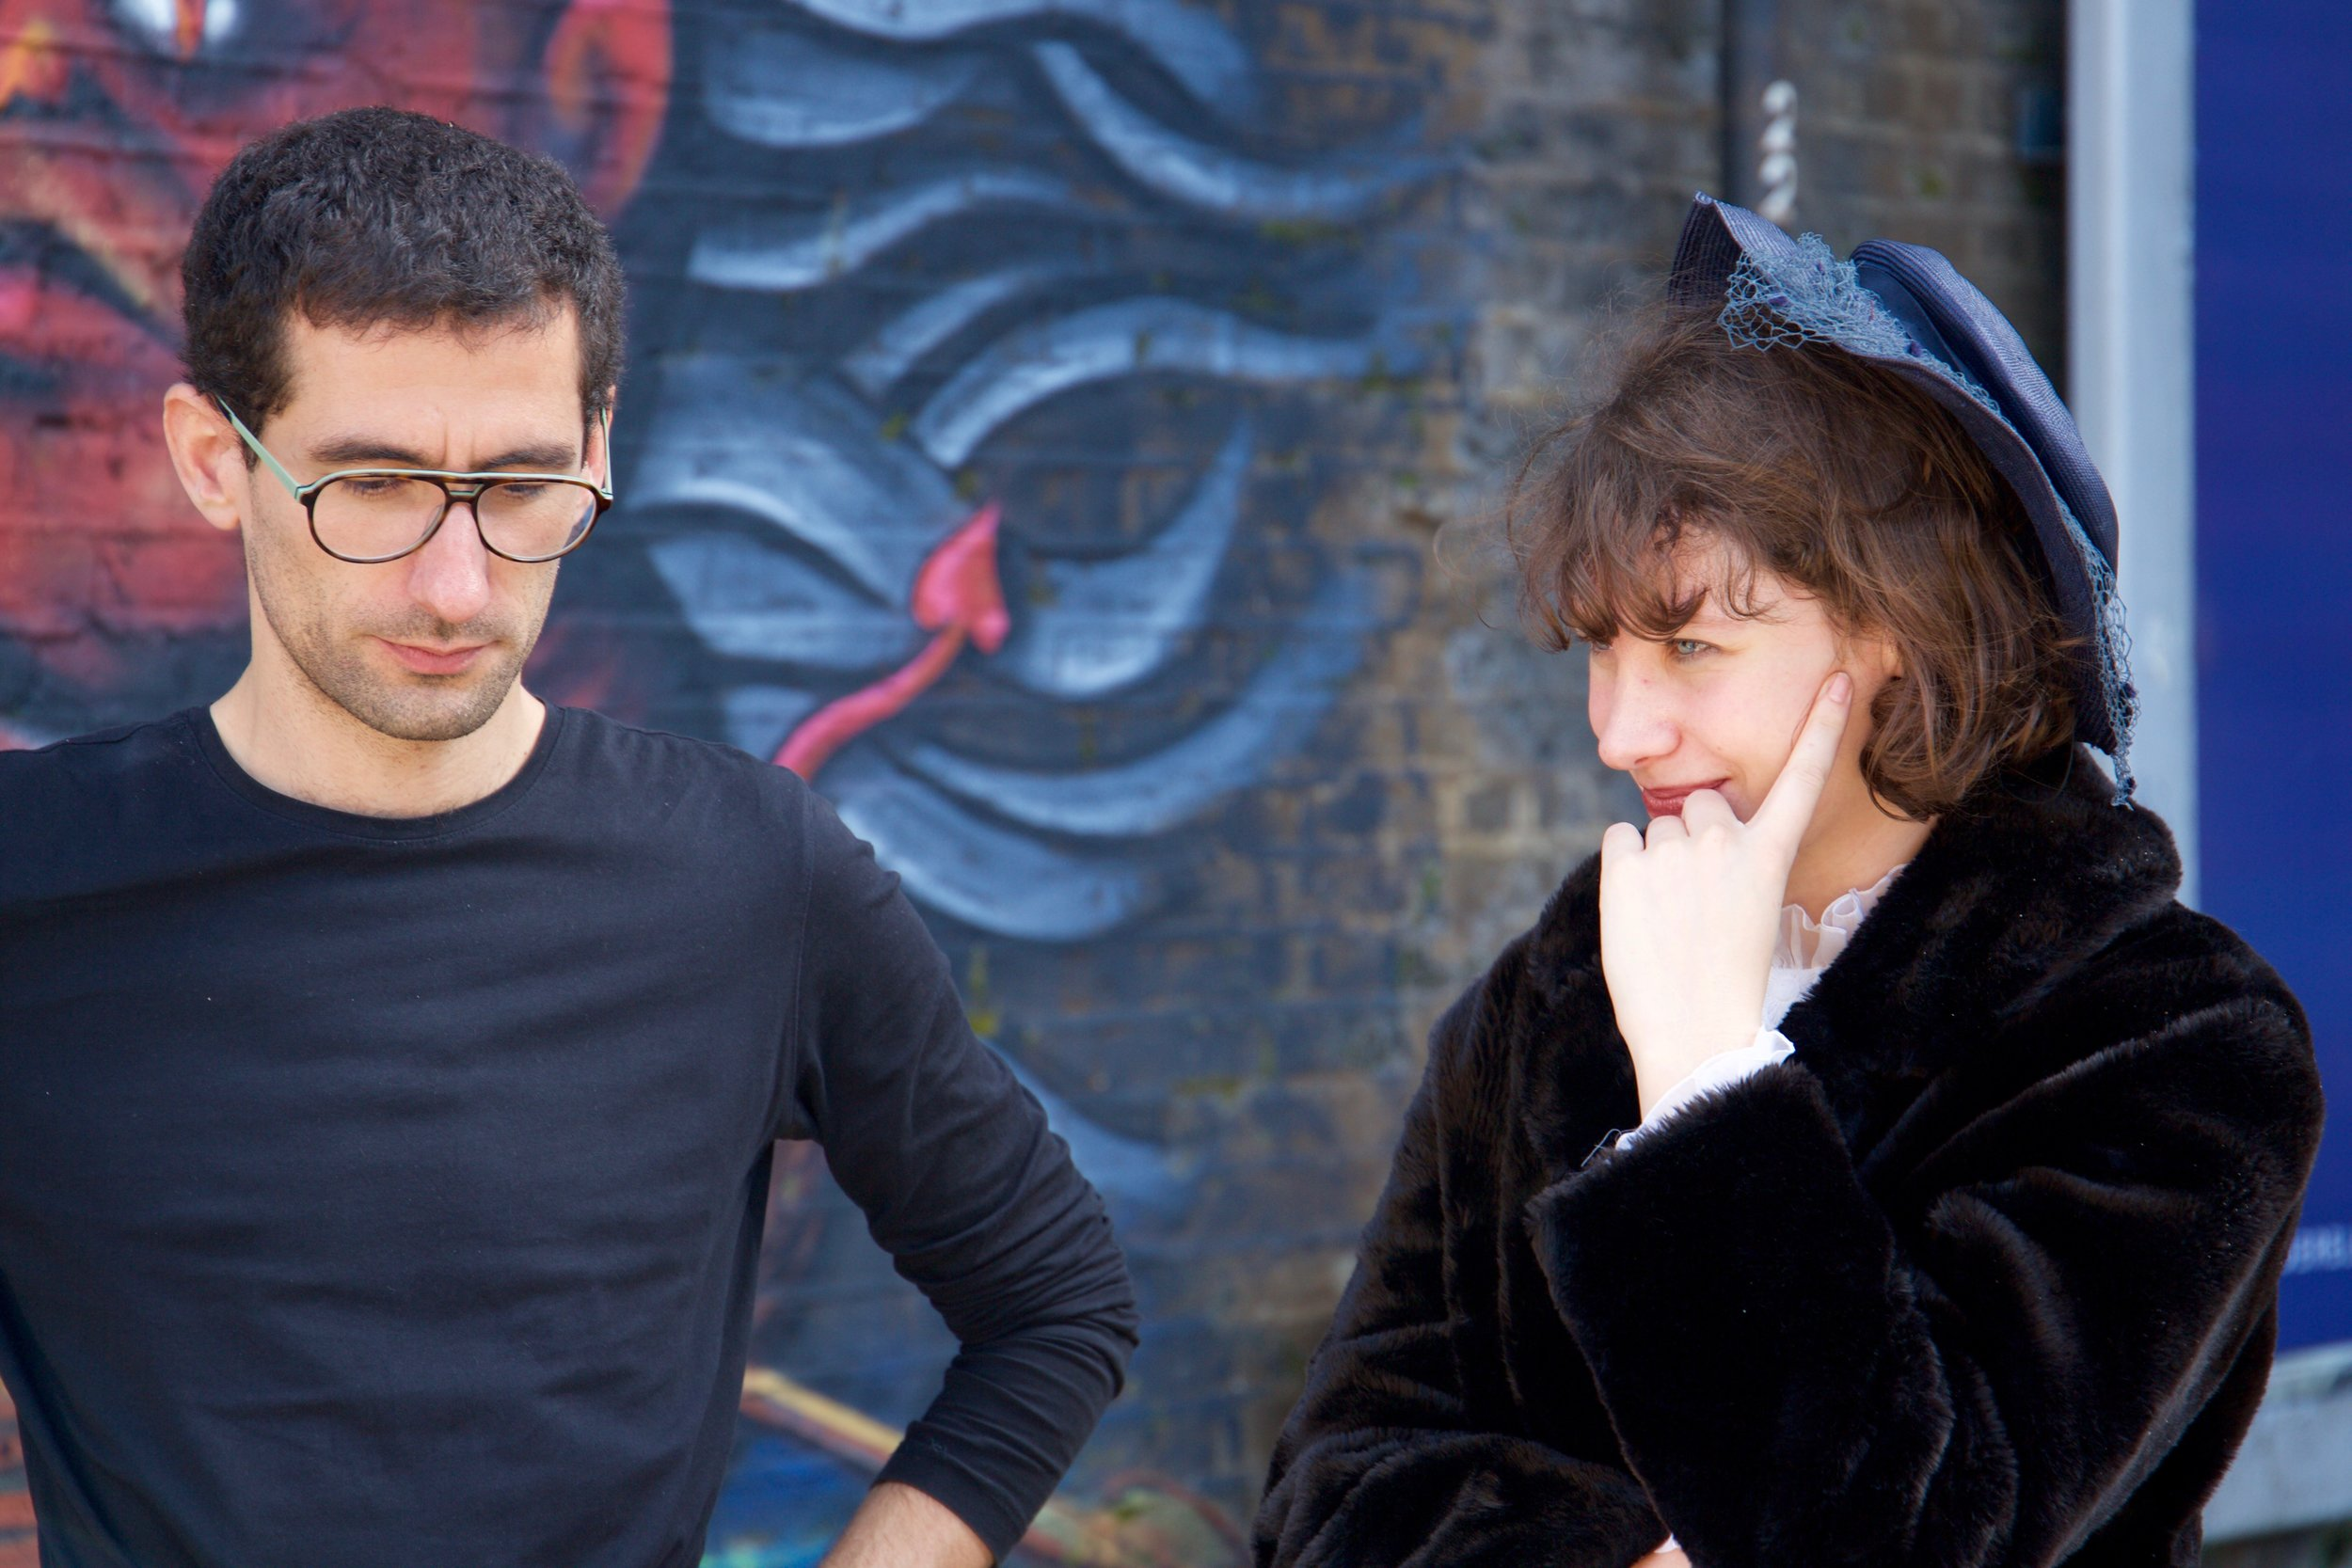 Copy of David Silva (director) and Stefania Ghasel Ritz (performer)